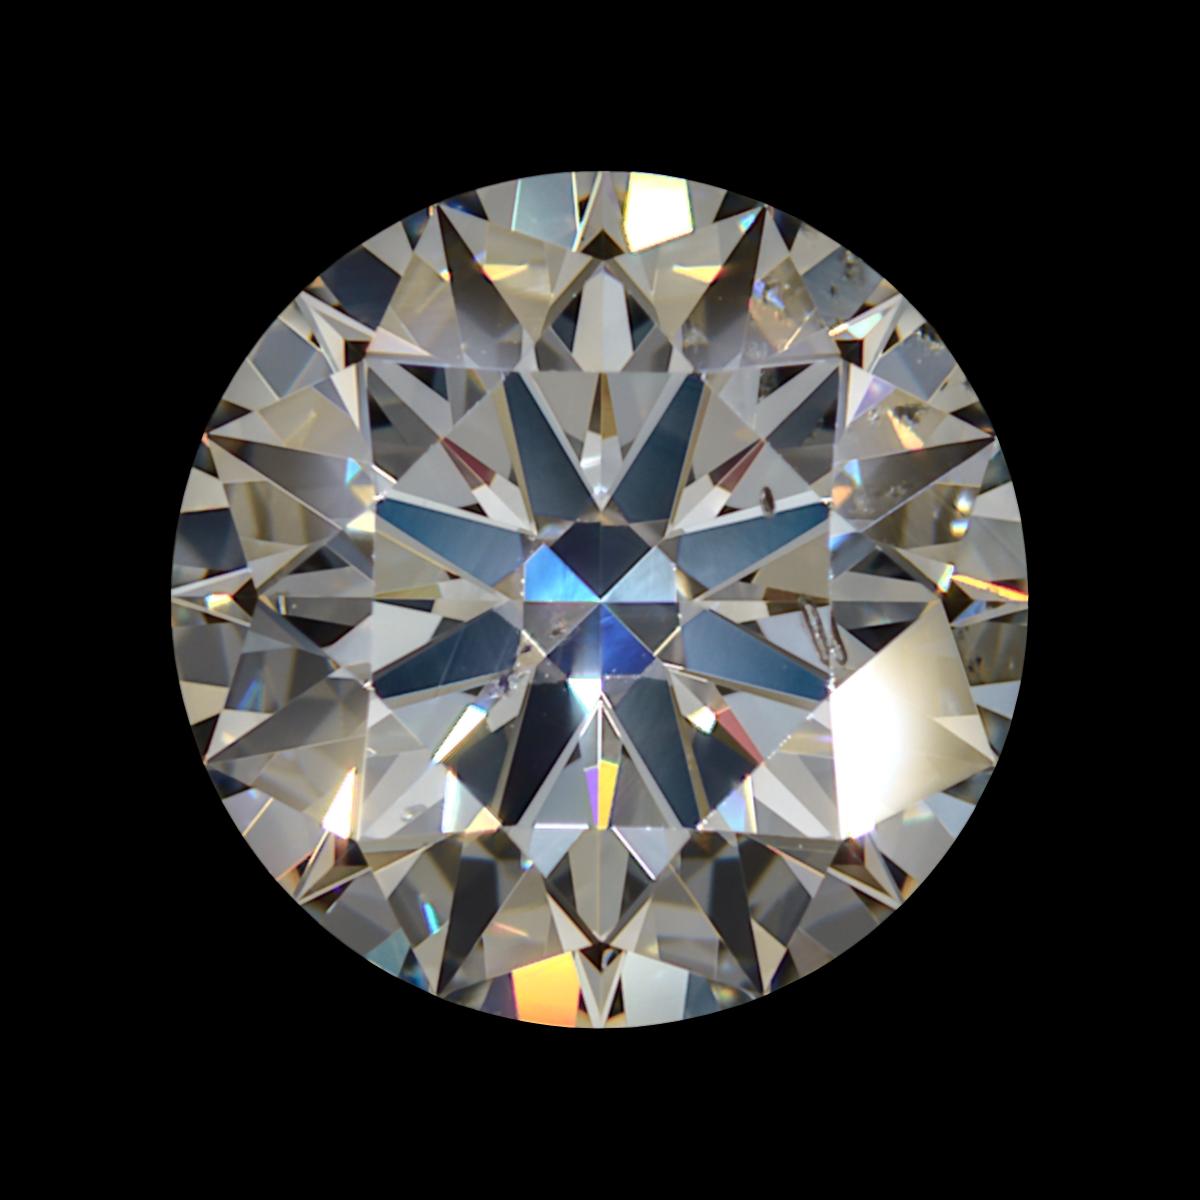 https://cdn.briangavindiamonds.com/files/mp4/BLAGS-104064812011/BLAGS-104064812011-Fire-02.mp4